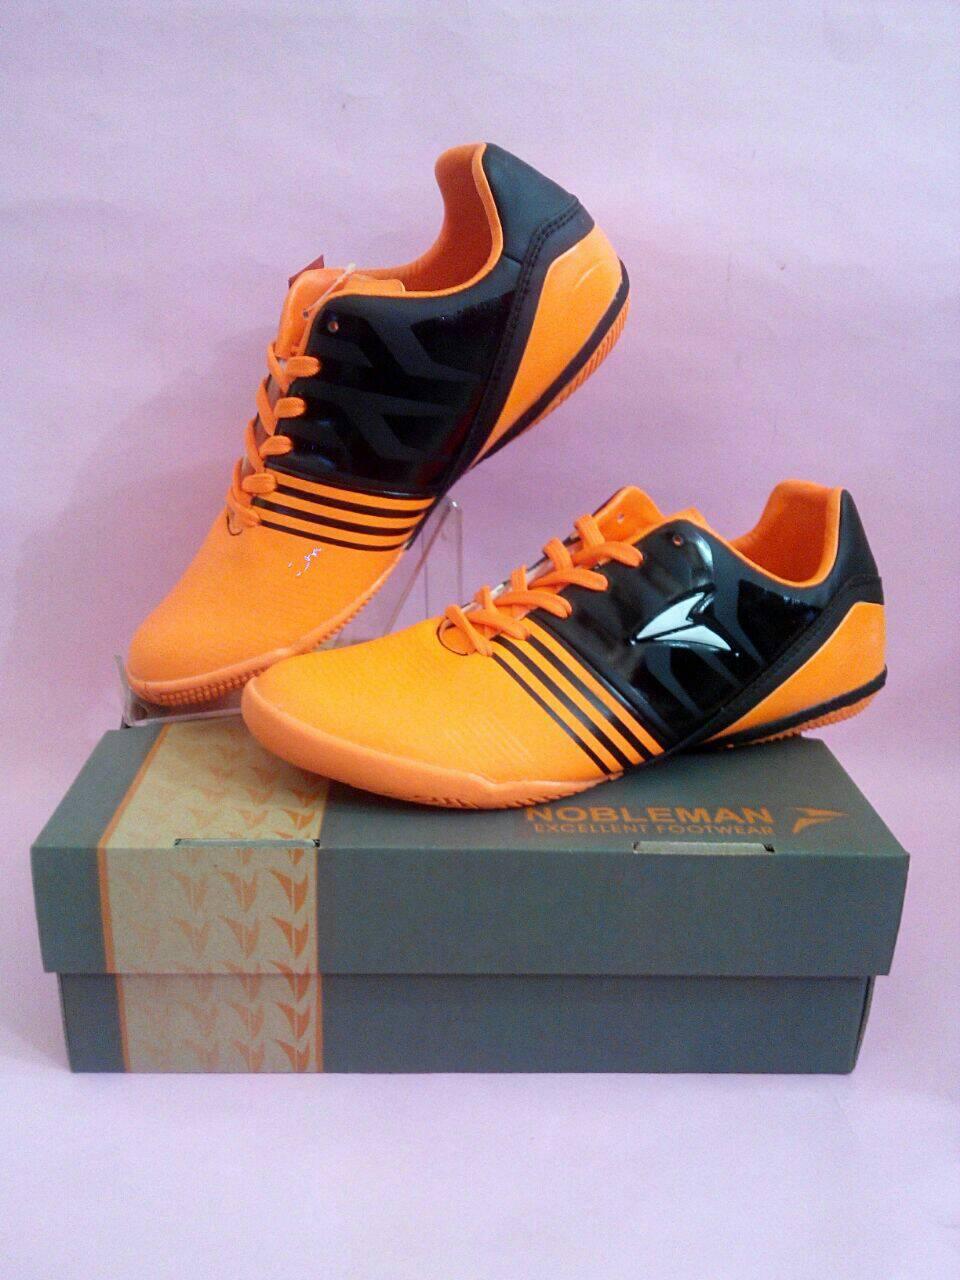 Jual Sepatu Futsal   Nobleman - Destro Futsal (Orange Black) - Toko ... 52409b0846